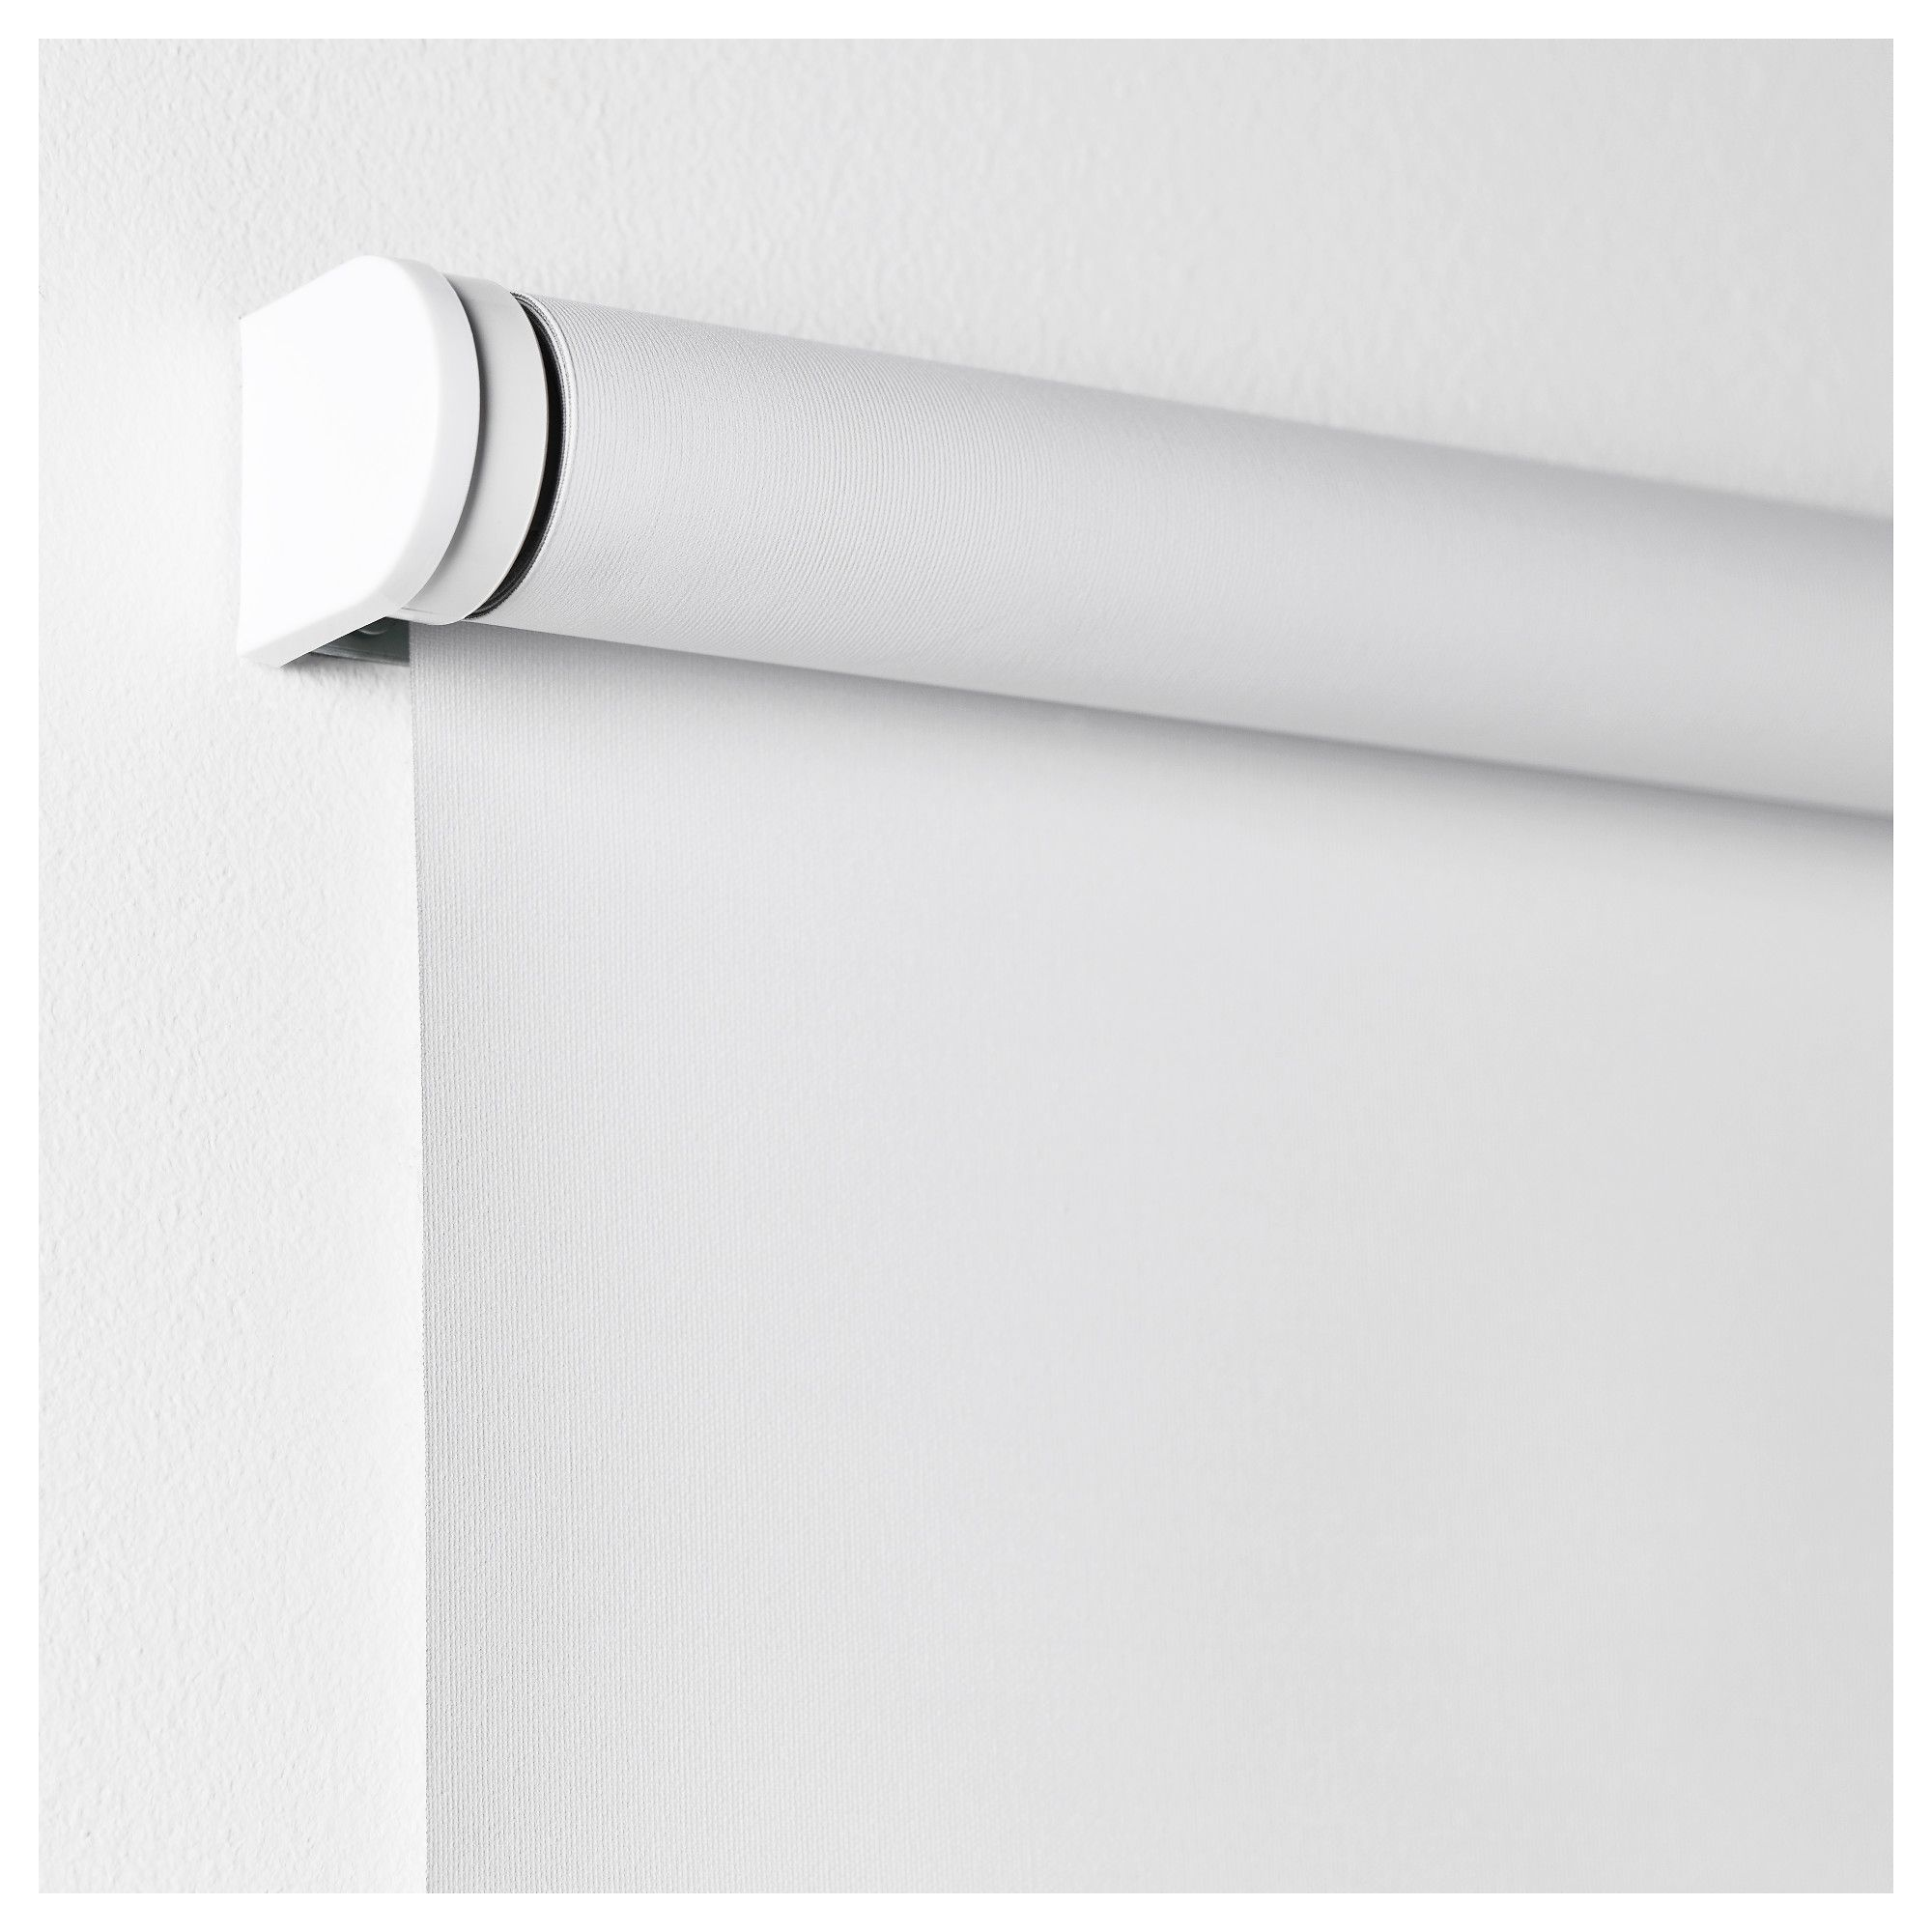 Ikea Tupplur Blackout Roller Blind White Blackout Roller Blinds Roller Blinds Curtains With Blinds